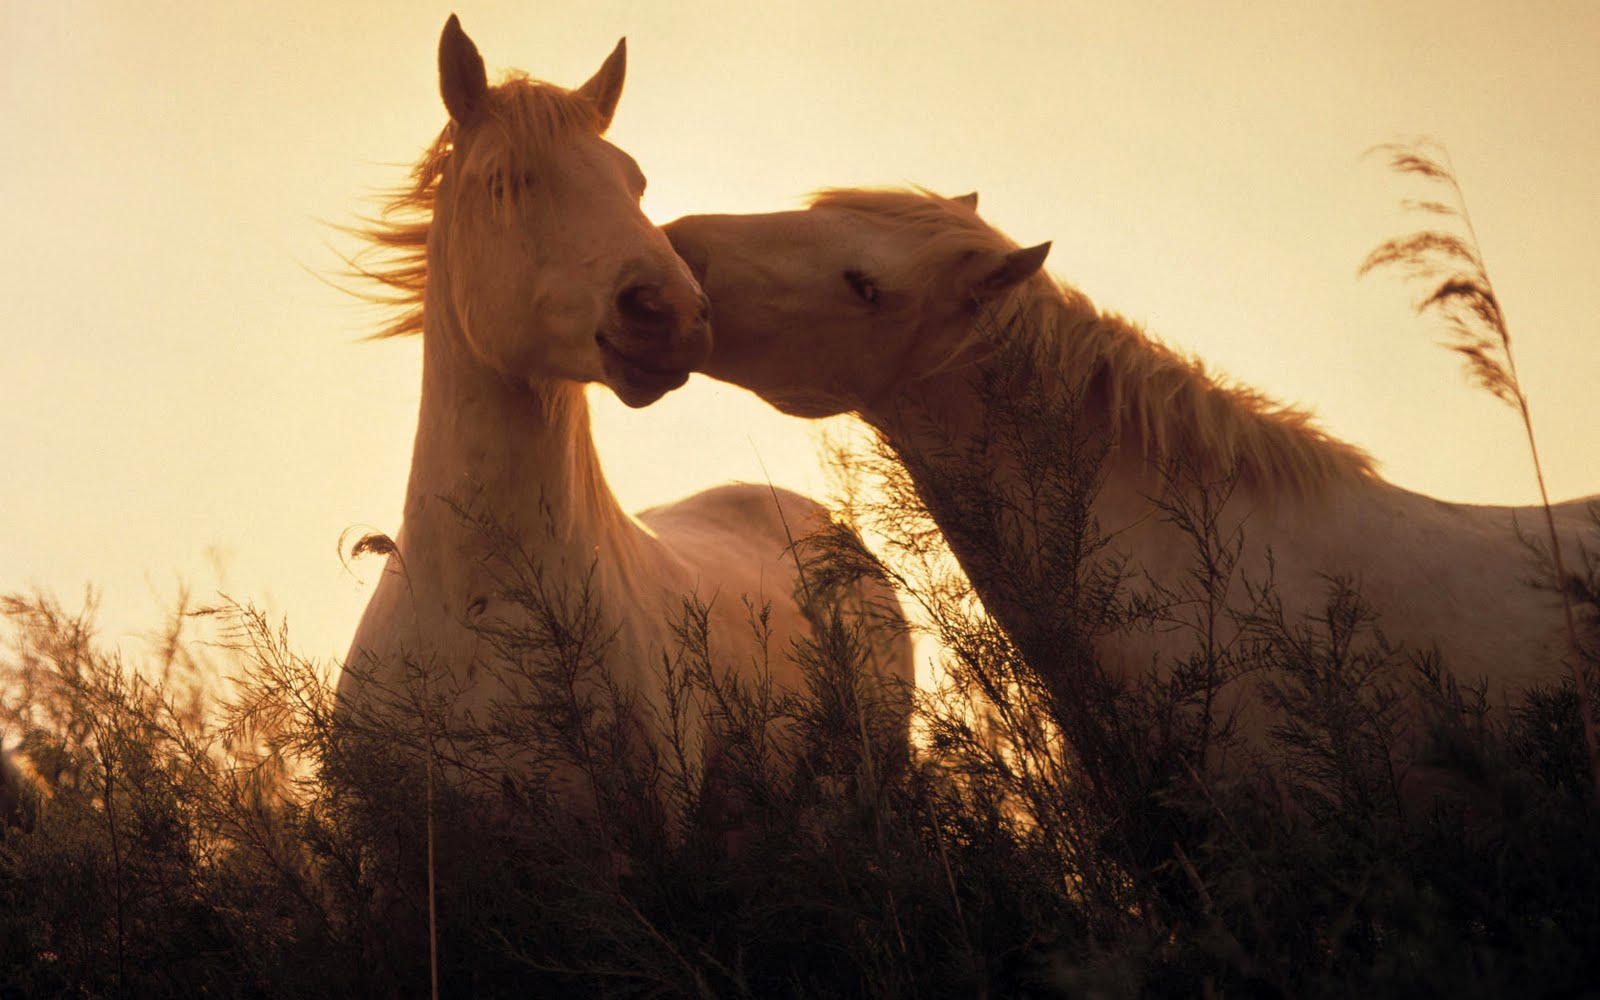 http://2.bp.blogspot.com/-0n3hZ0IOX8Q/TeiOoaHA_FI/AAAAAAAAAiE/nKcrvedkr-g/s1600/horses-in-love-wallpaper-1920x1200-0914.jpg